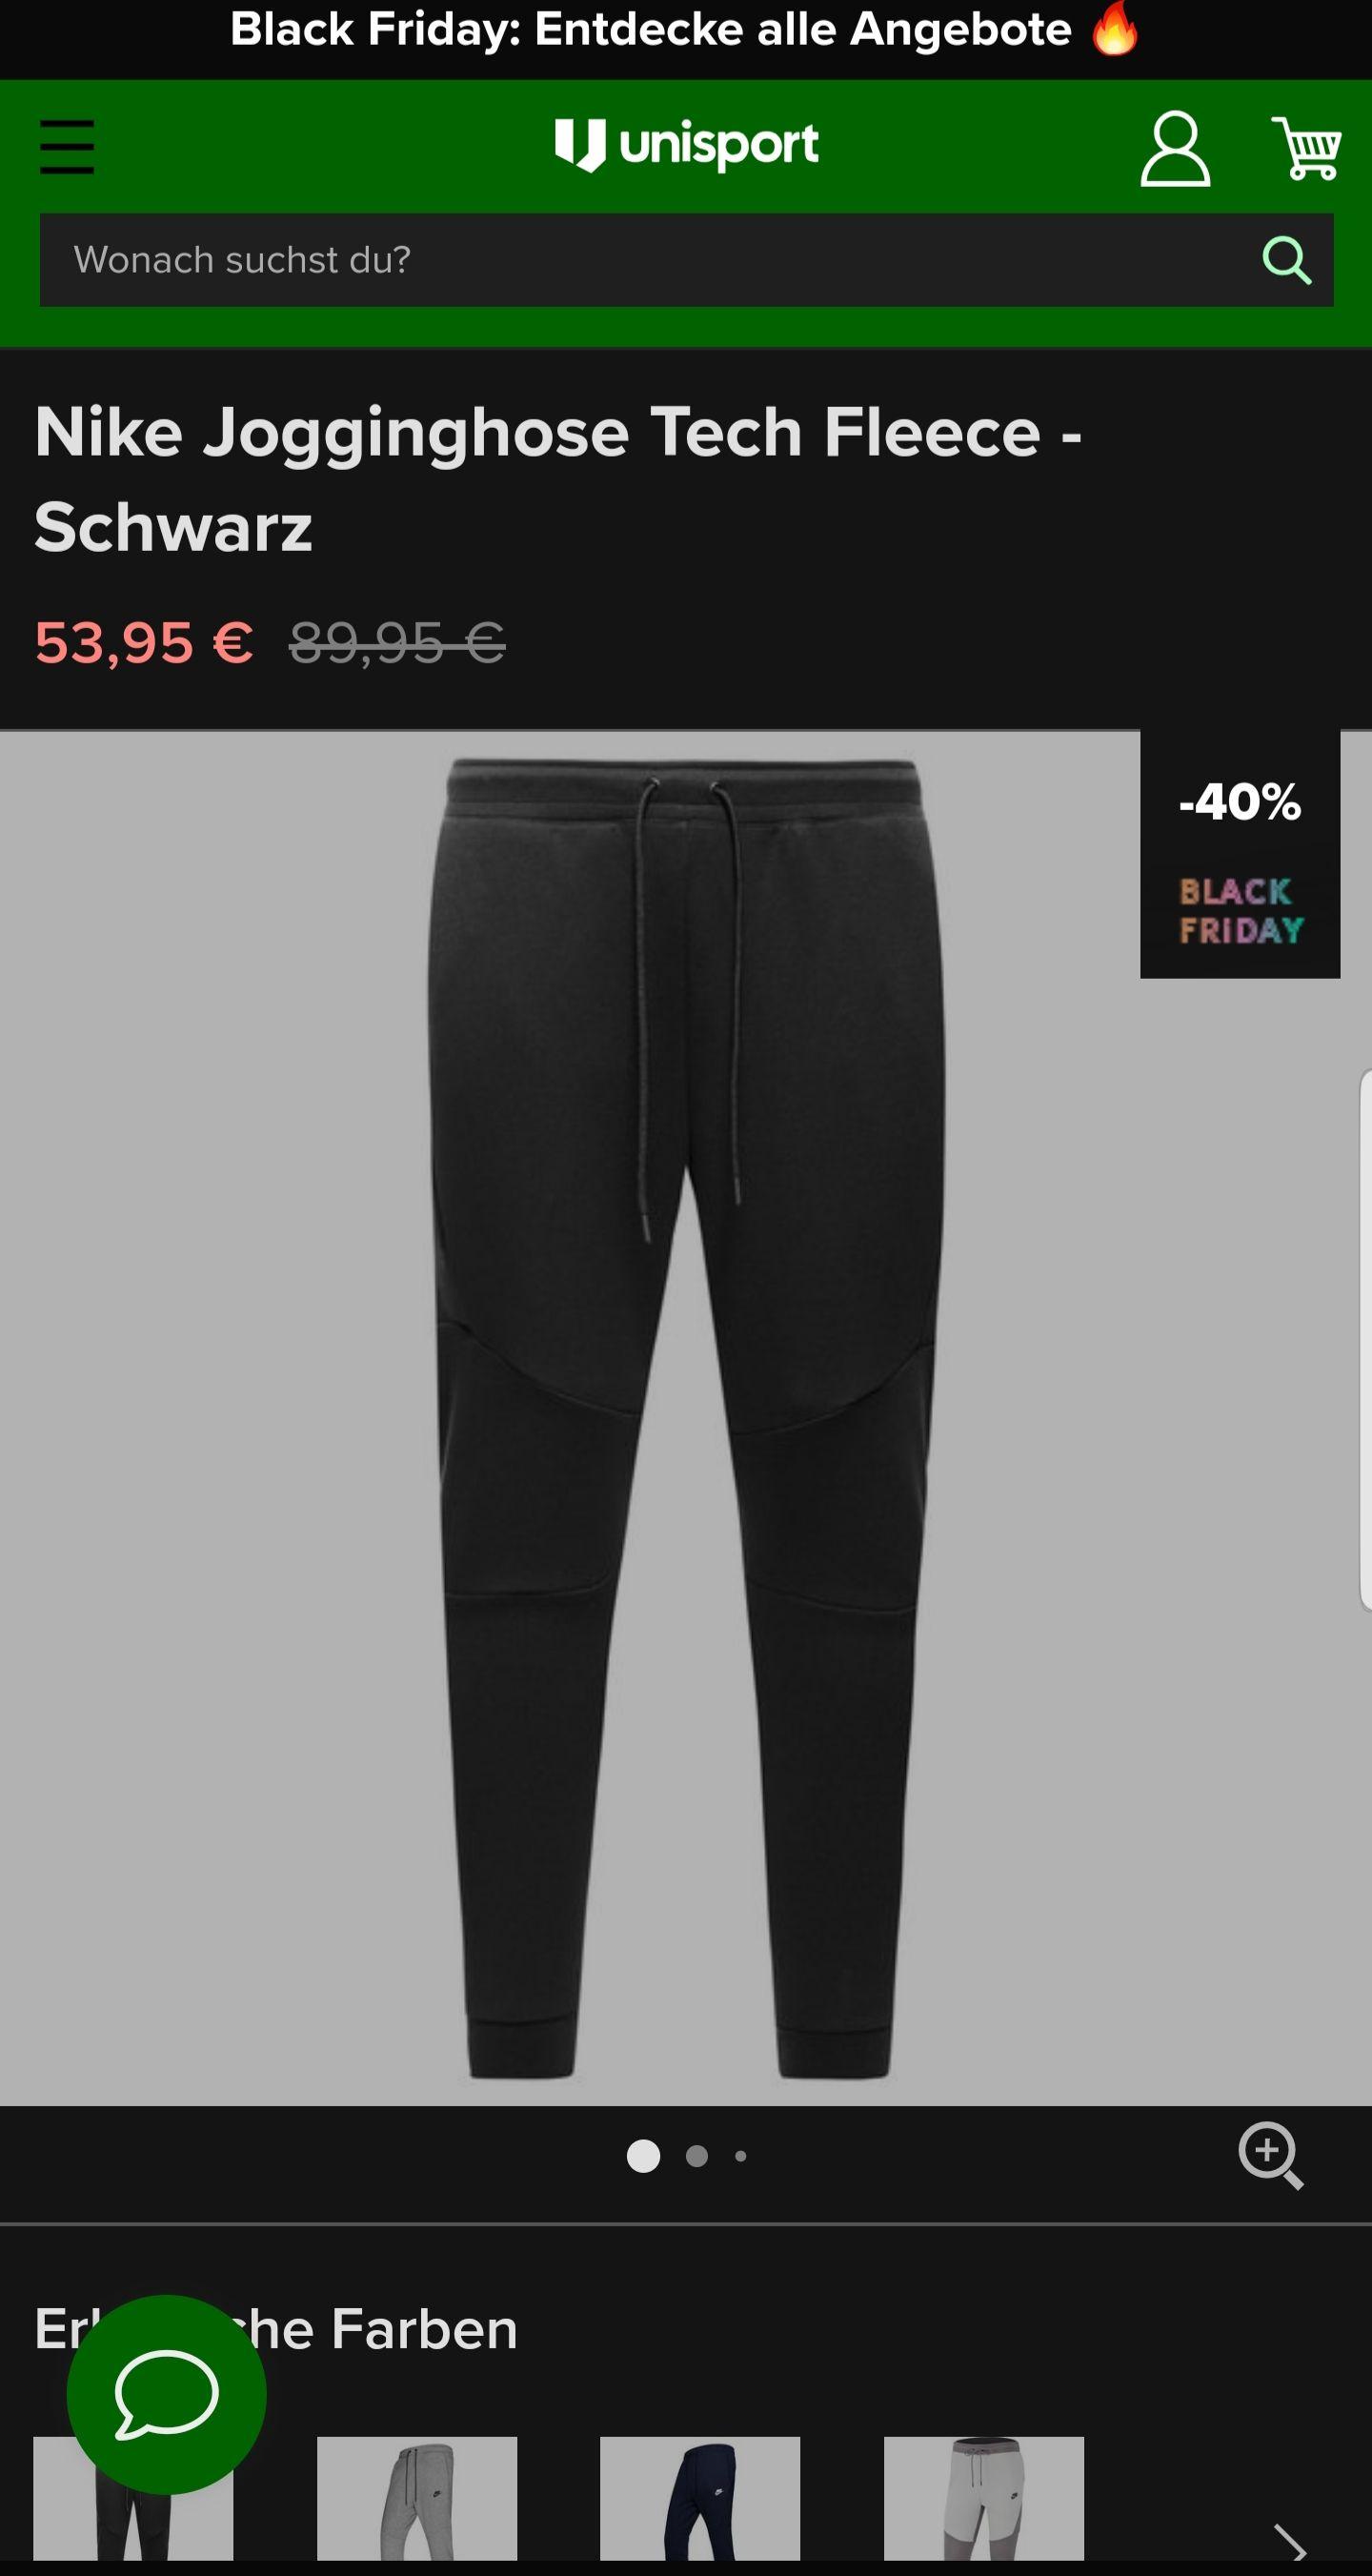 Nike Jogginghose Tech Fleece - Schwarz